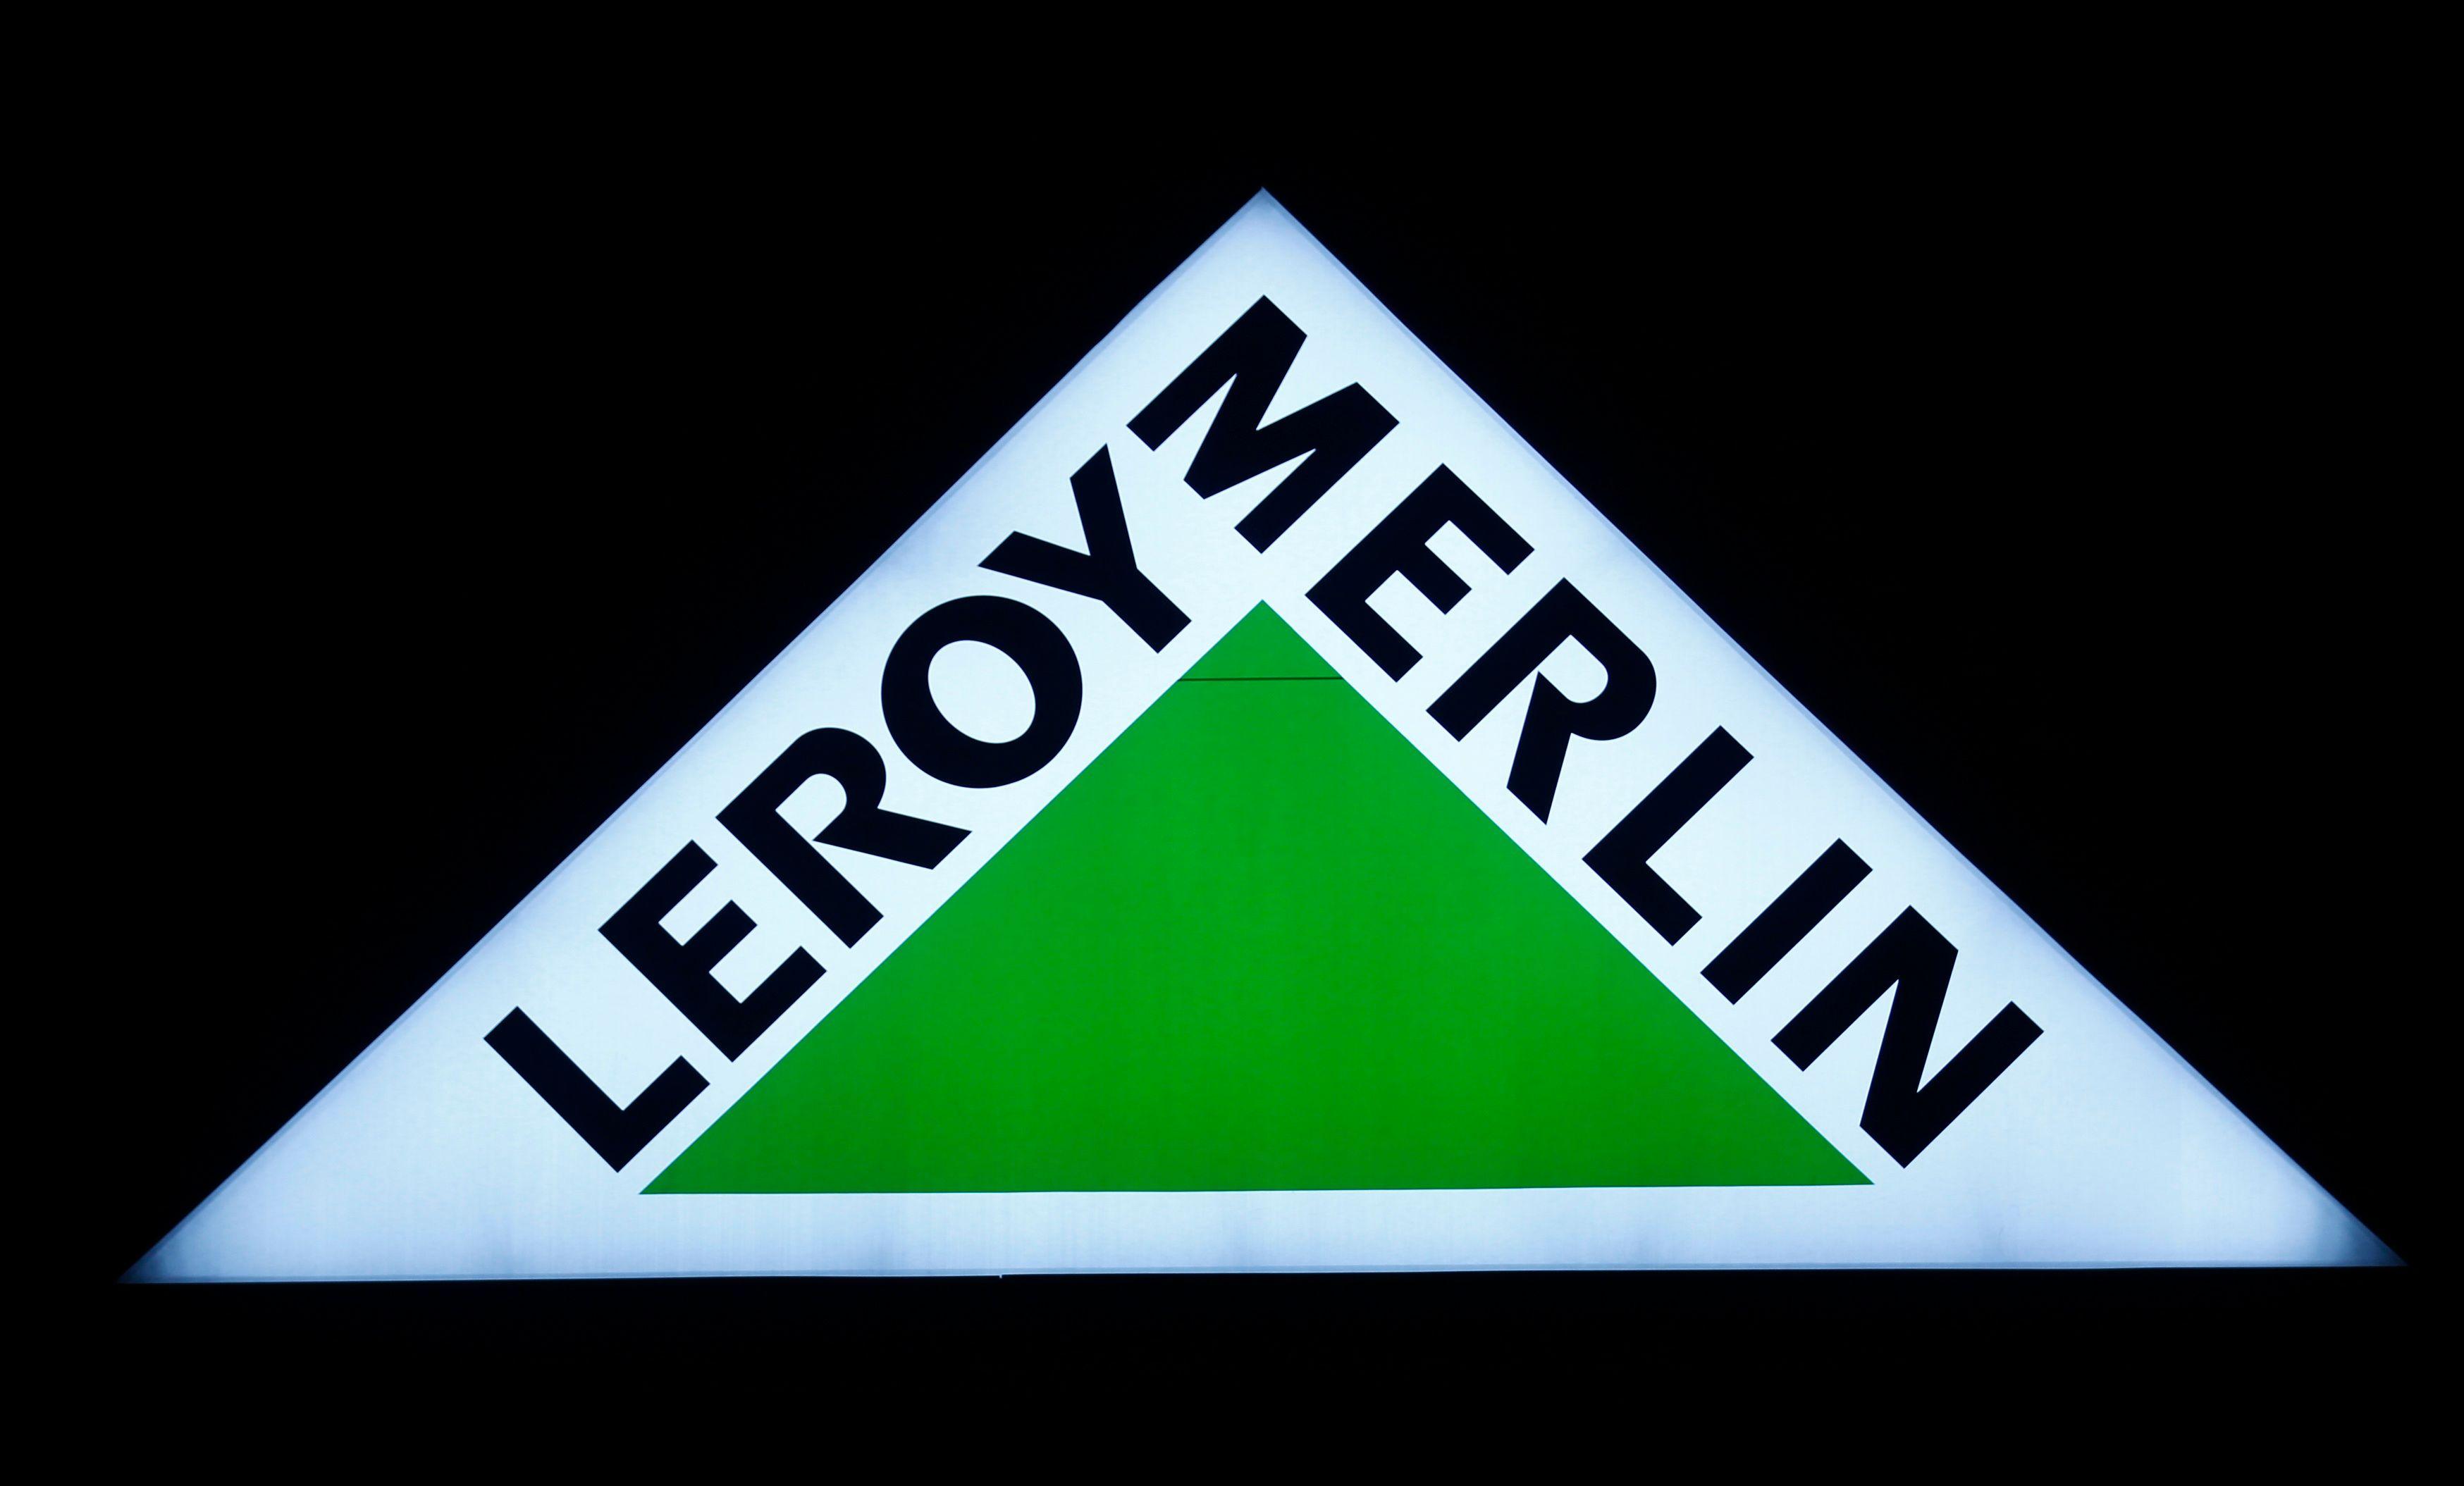 Leroy Merlin et Castorama ne sont pas condamnés